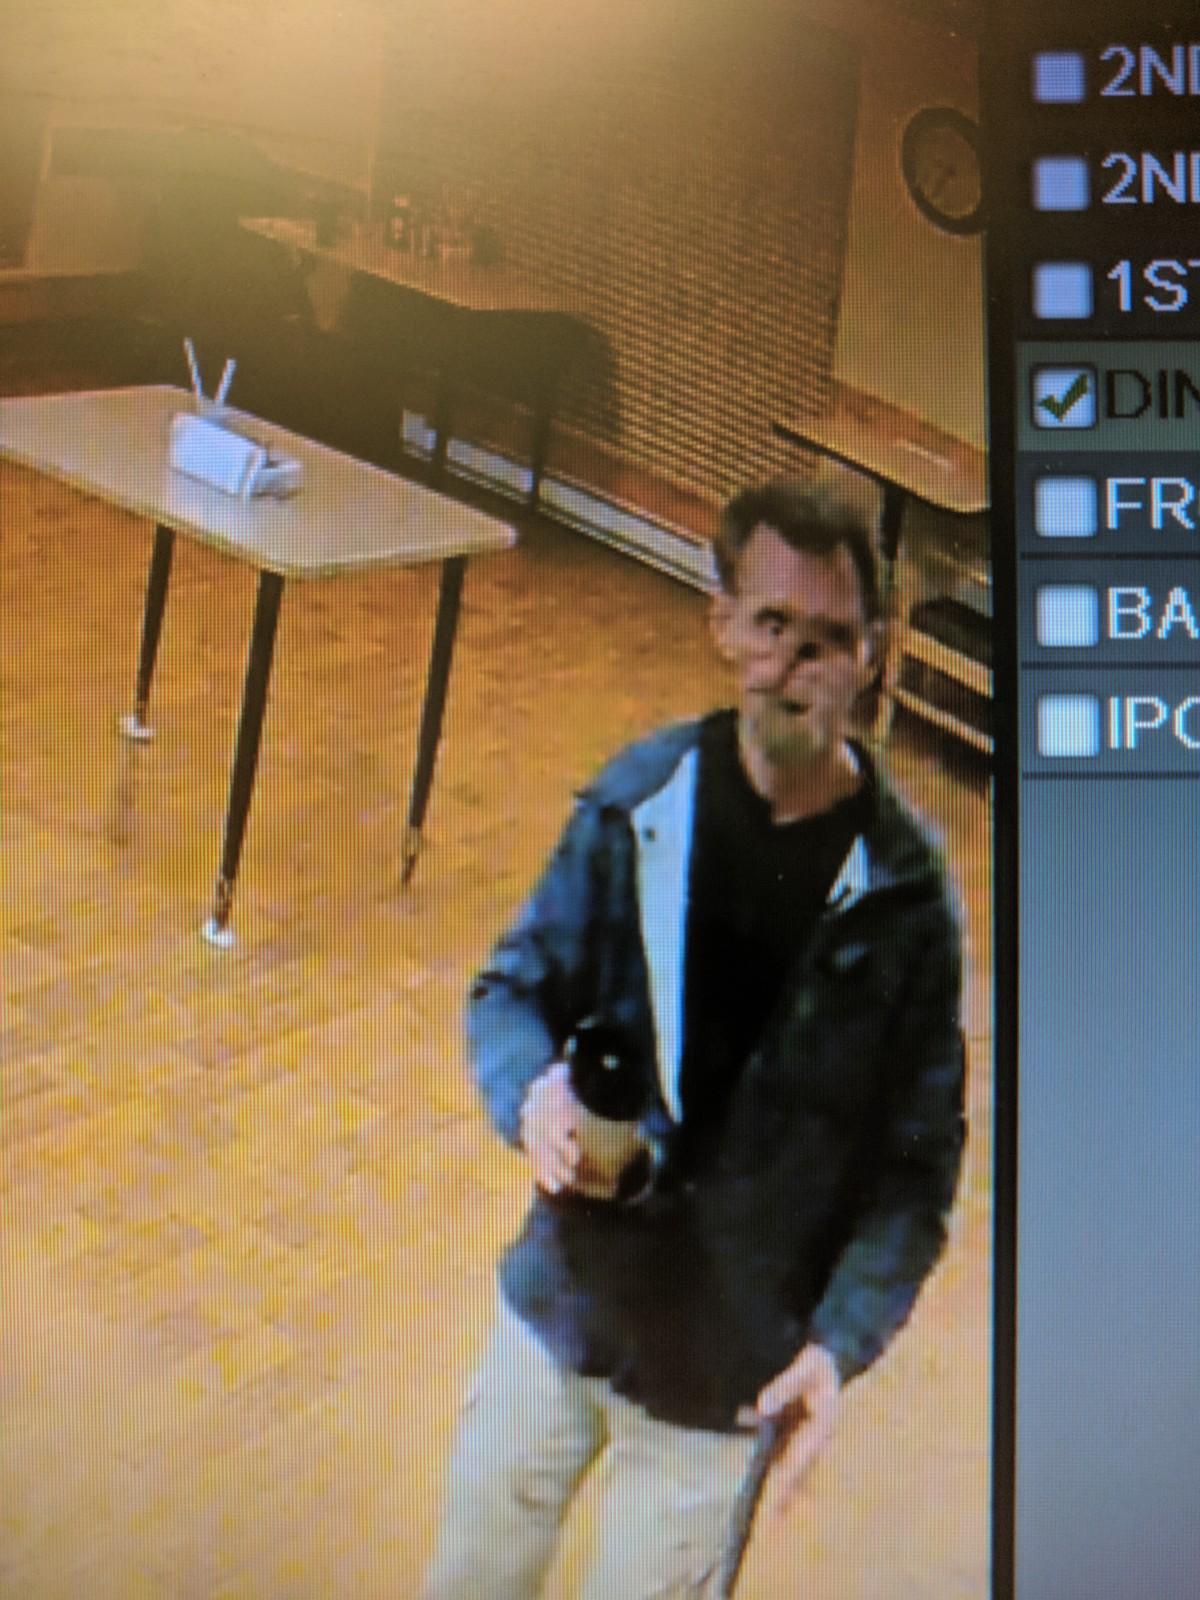 Surrey RCMP still need help locating 48 yr old Danny Bayer